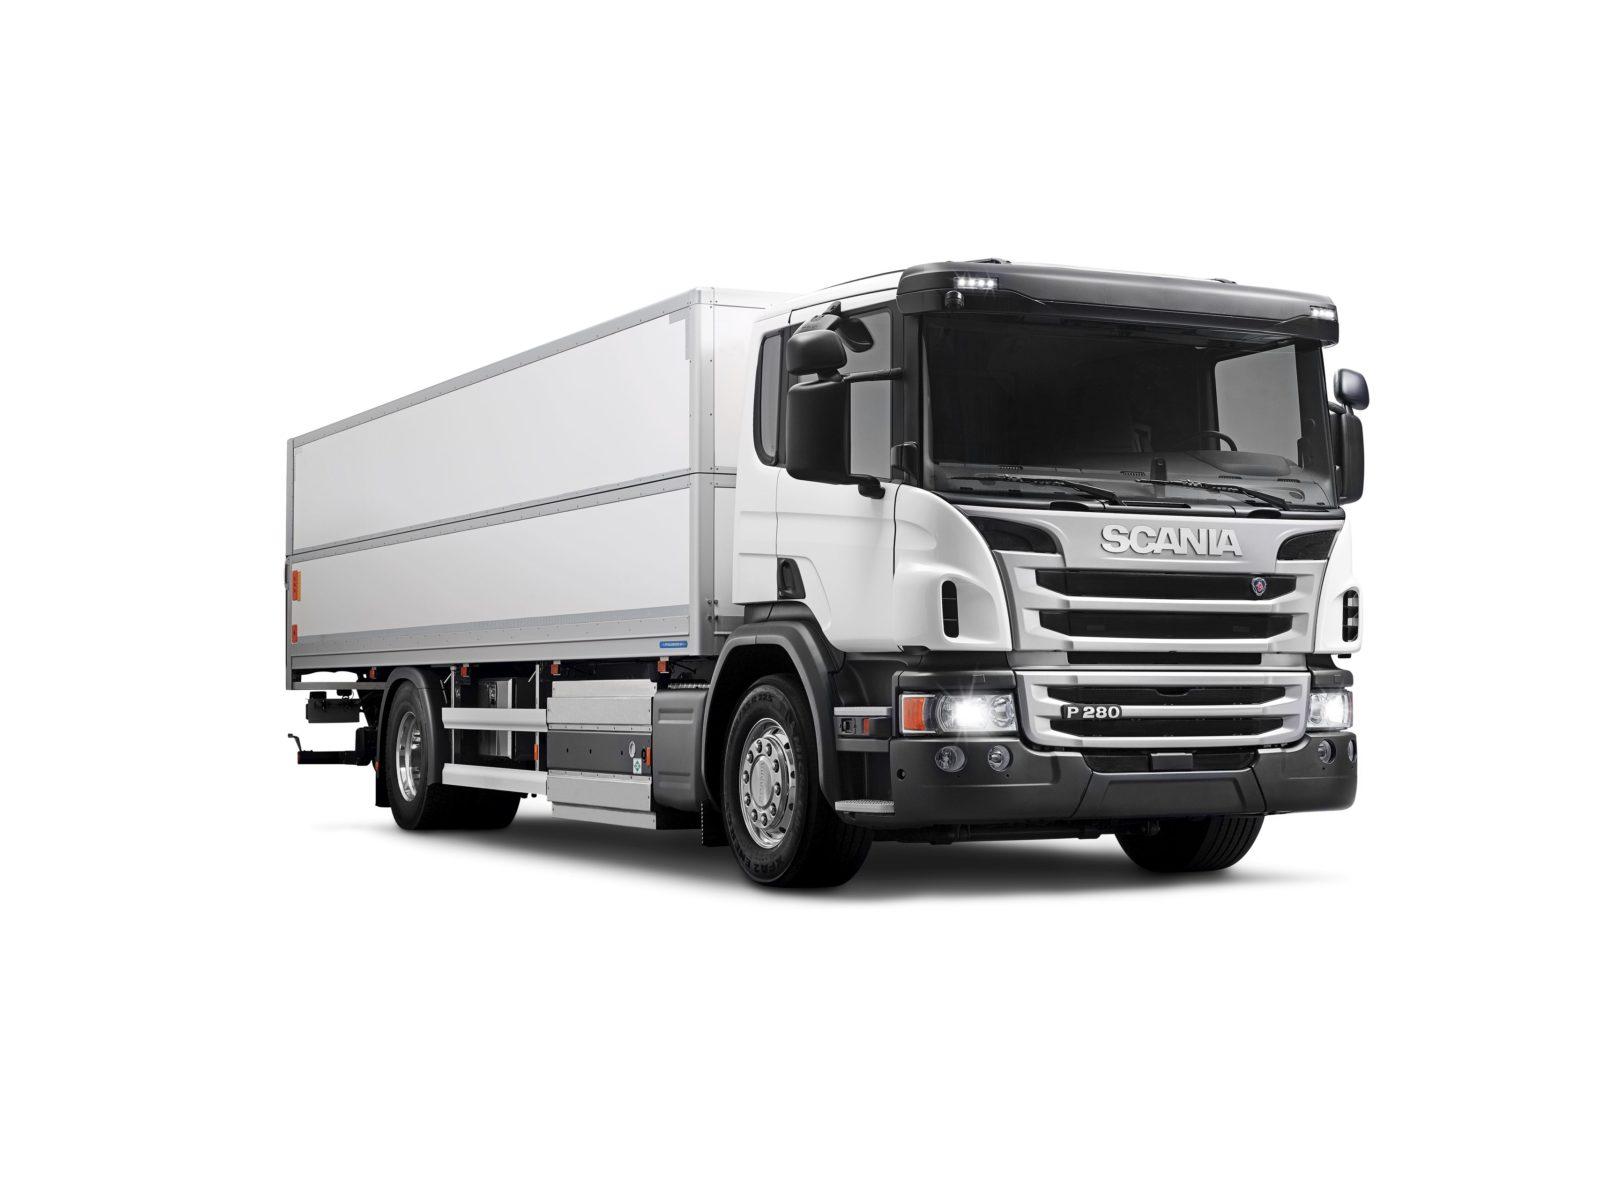 Scania. Крестовина карданного вала